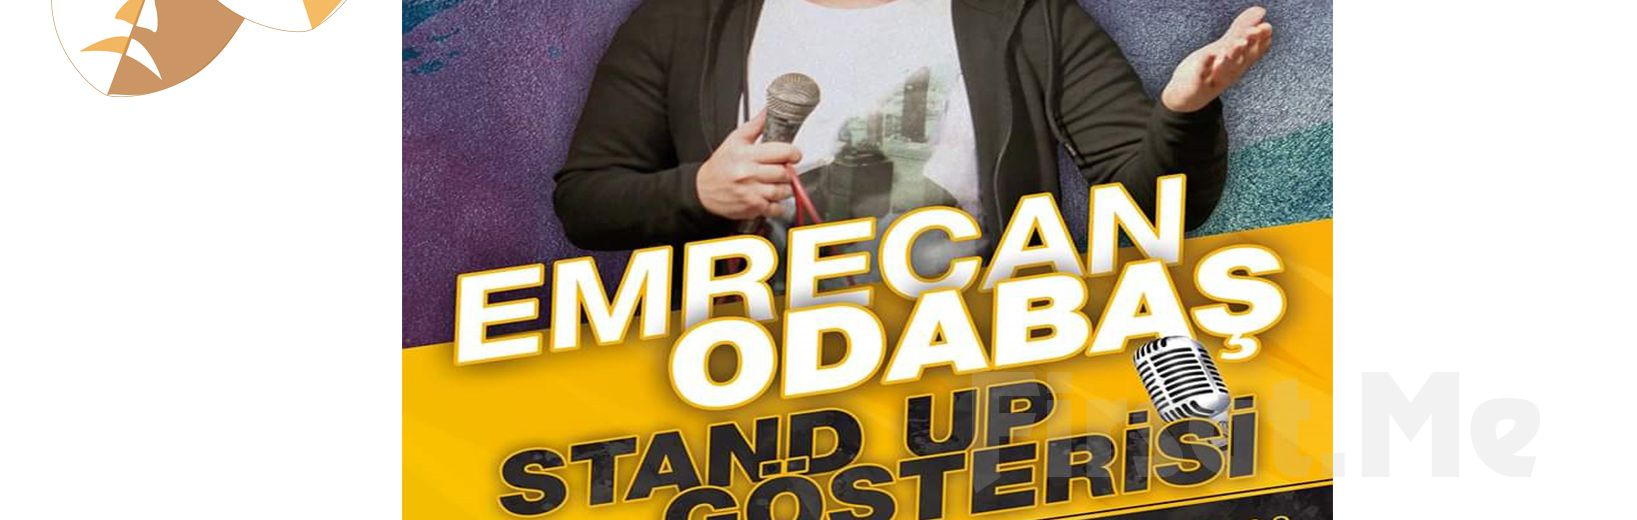 Emrecan Odabaş'tan Stand Up Gösteri Bileti